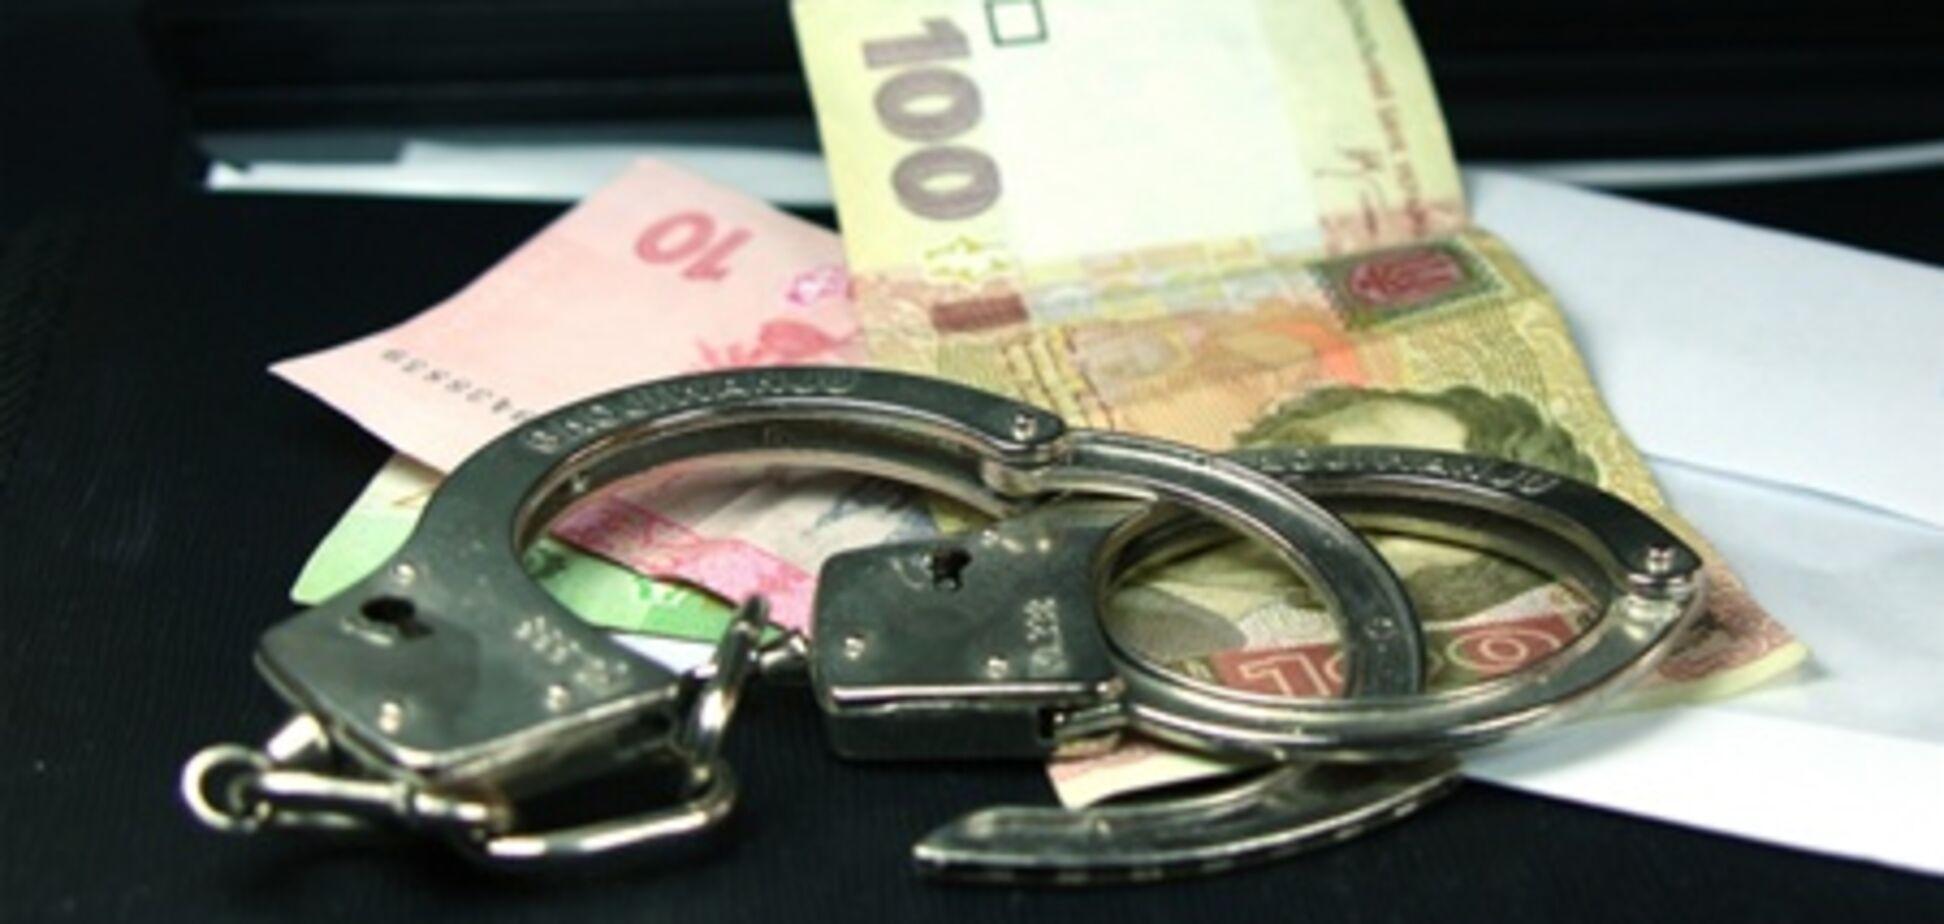 Бывшему главе РГА за взятку дали 9 лет тюрьмы